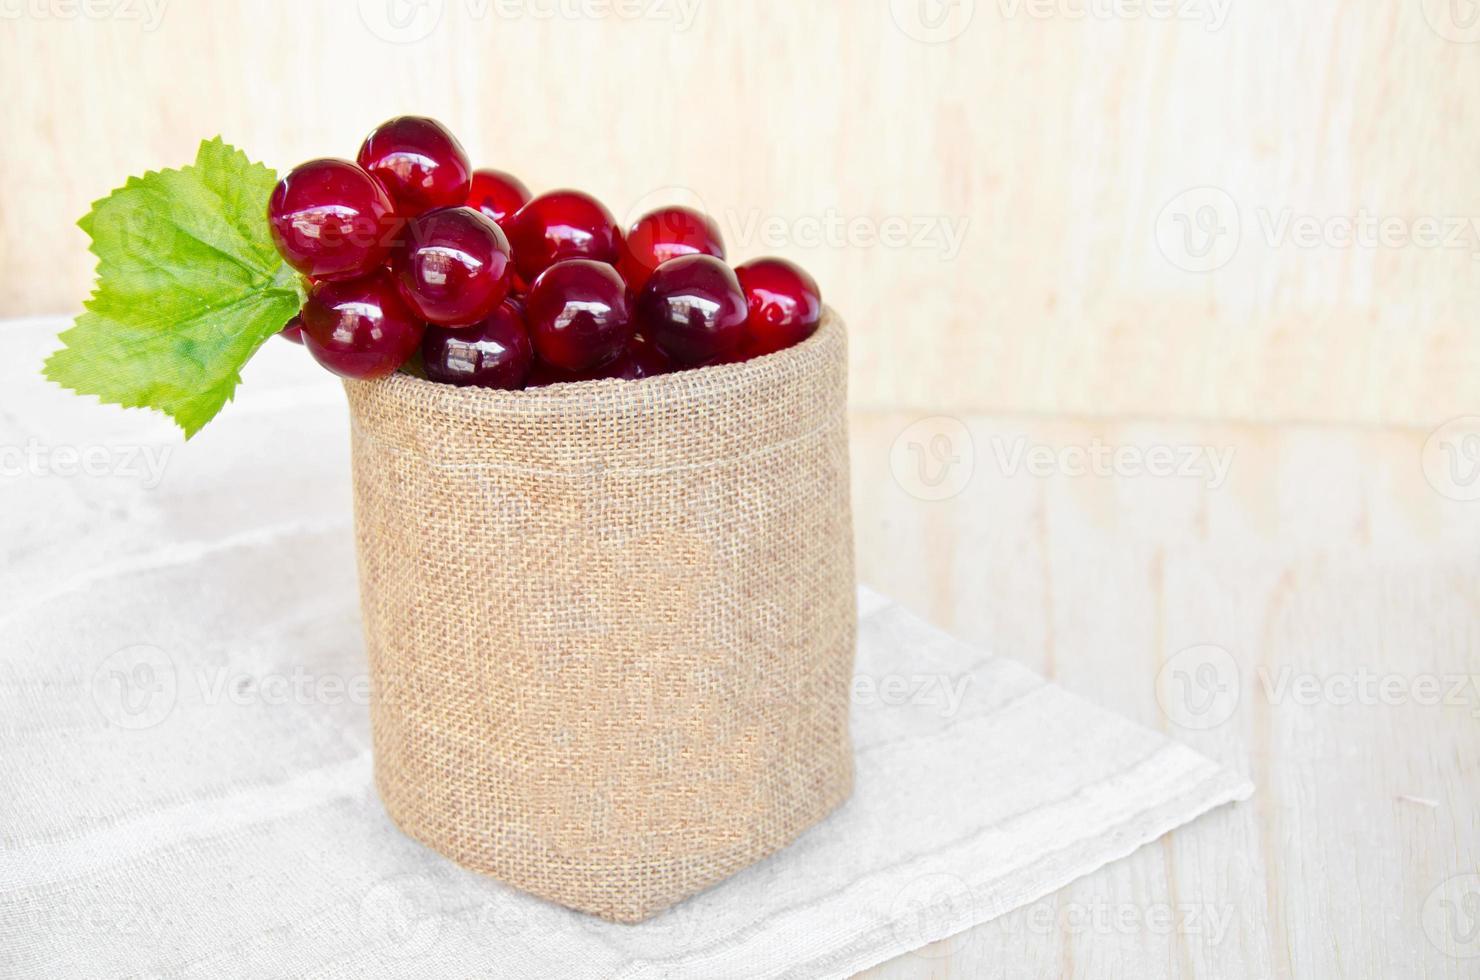 druvor i säckväska foto